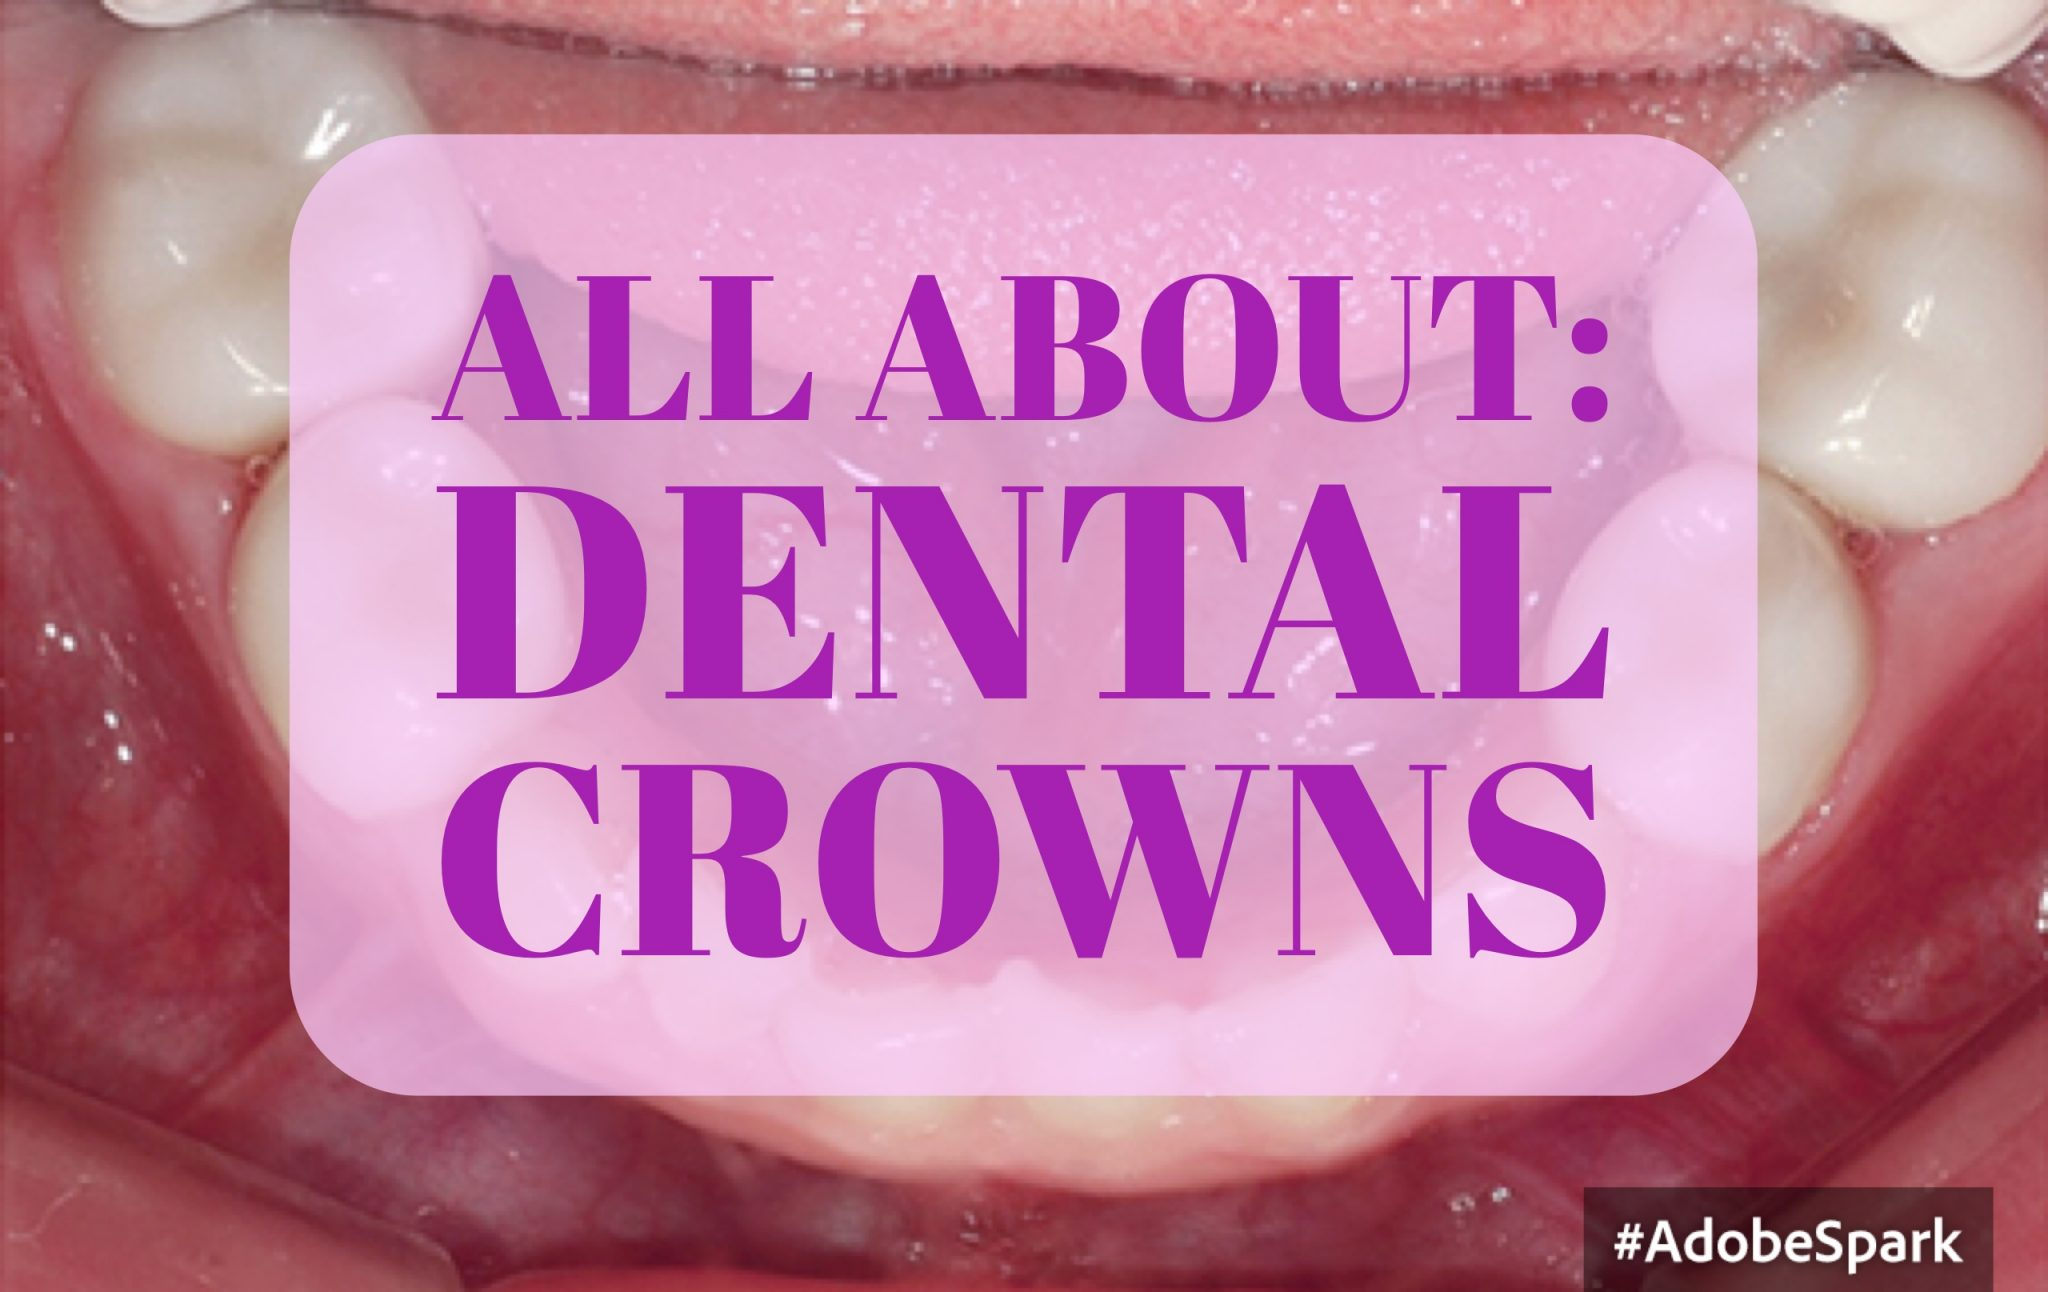 Pediatric Dental Crowns